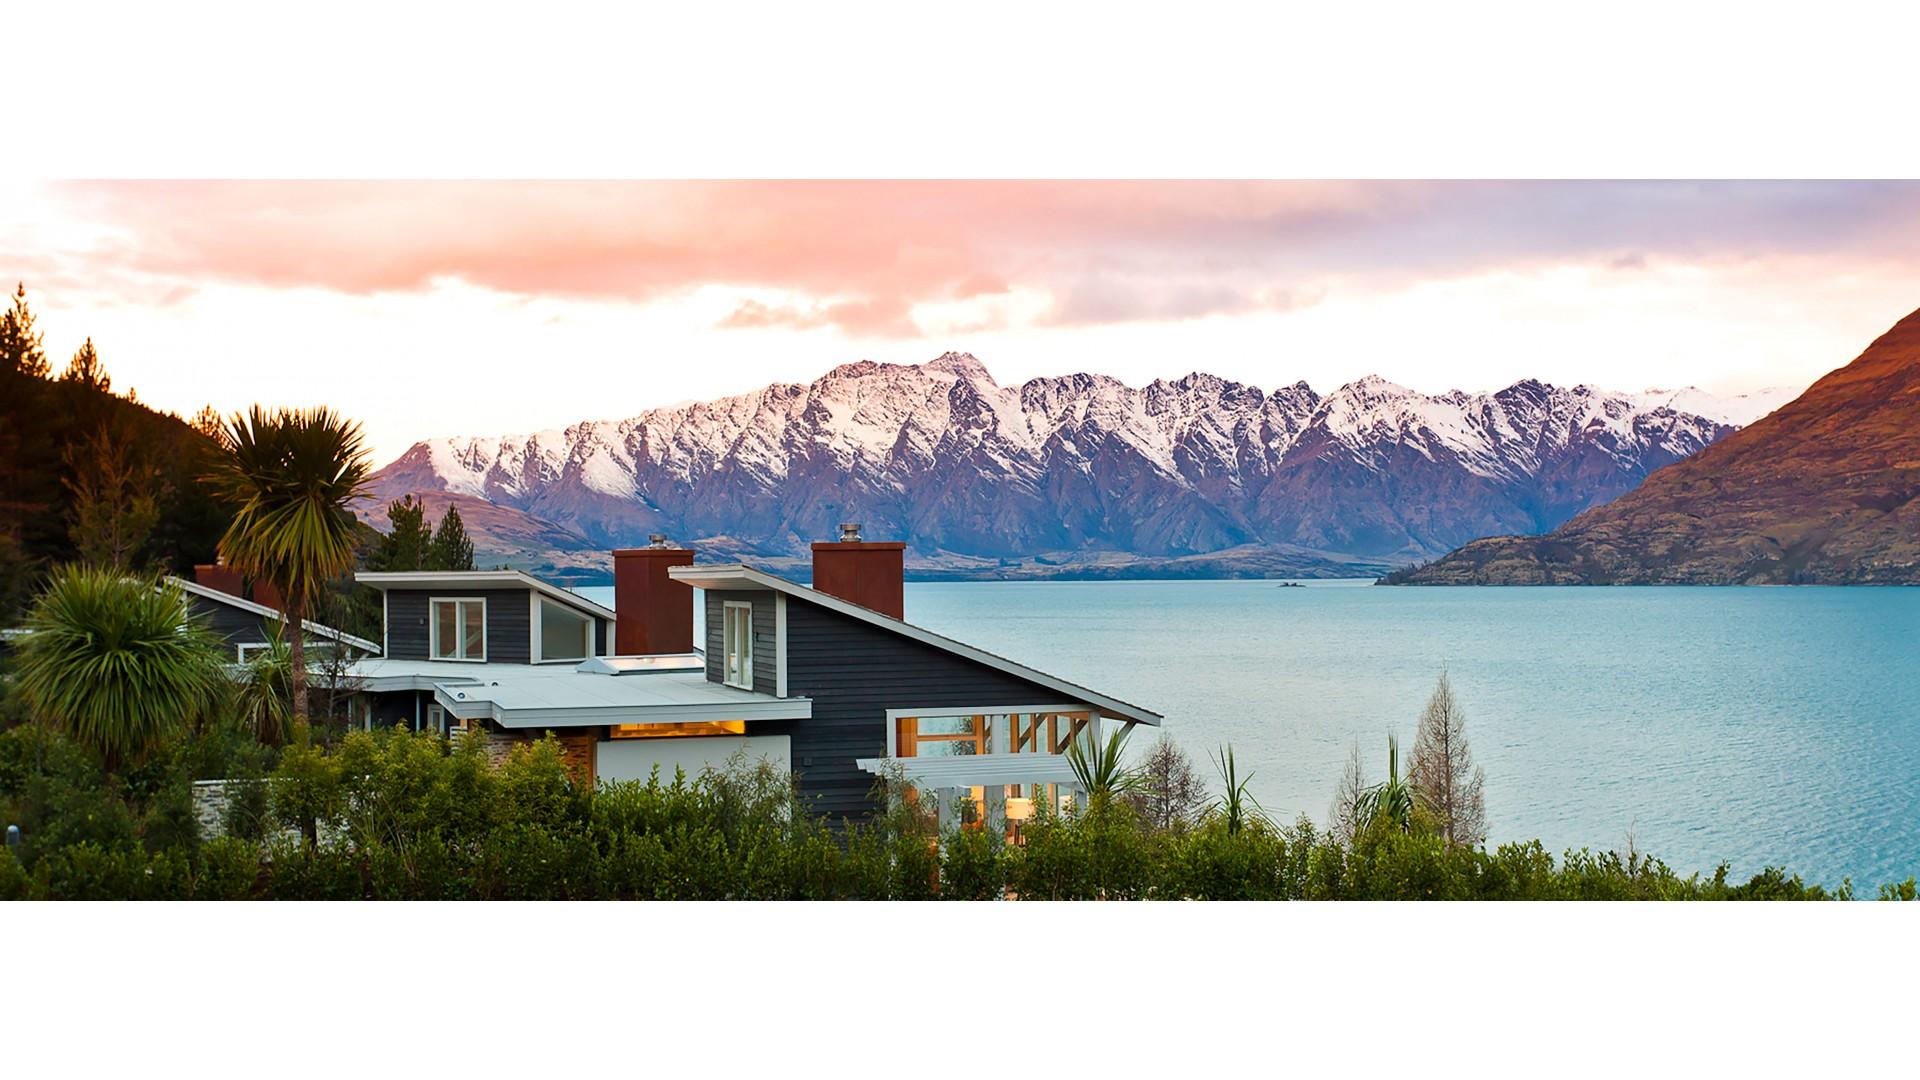 Matakauri Lodge hotel - Mount Creighton, Queenstown - South Island ...